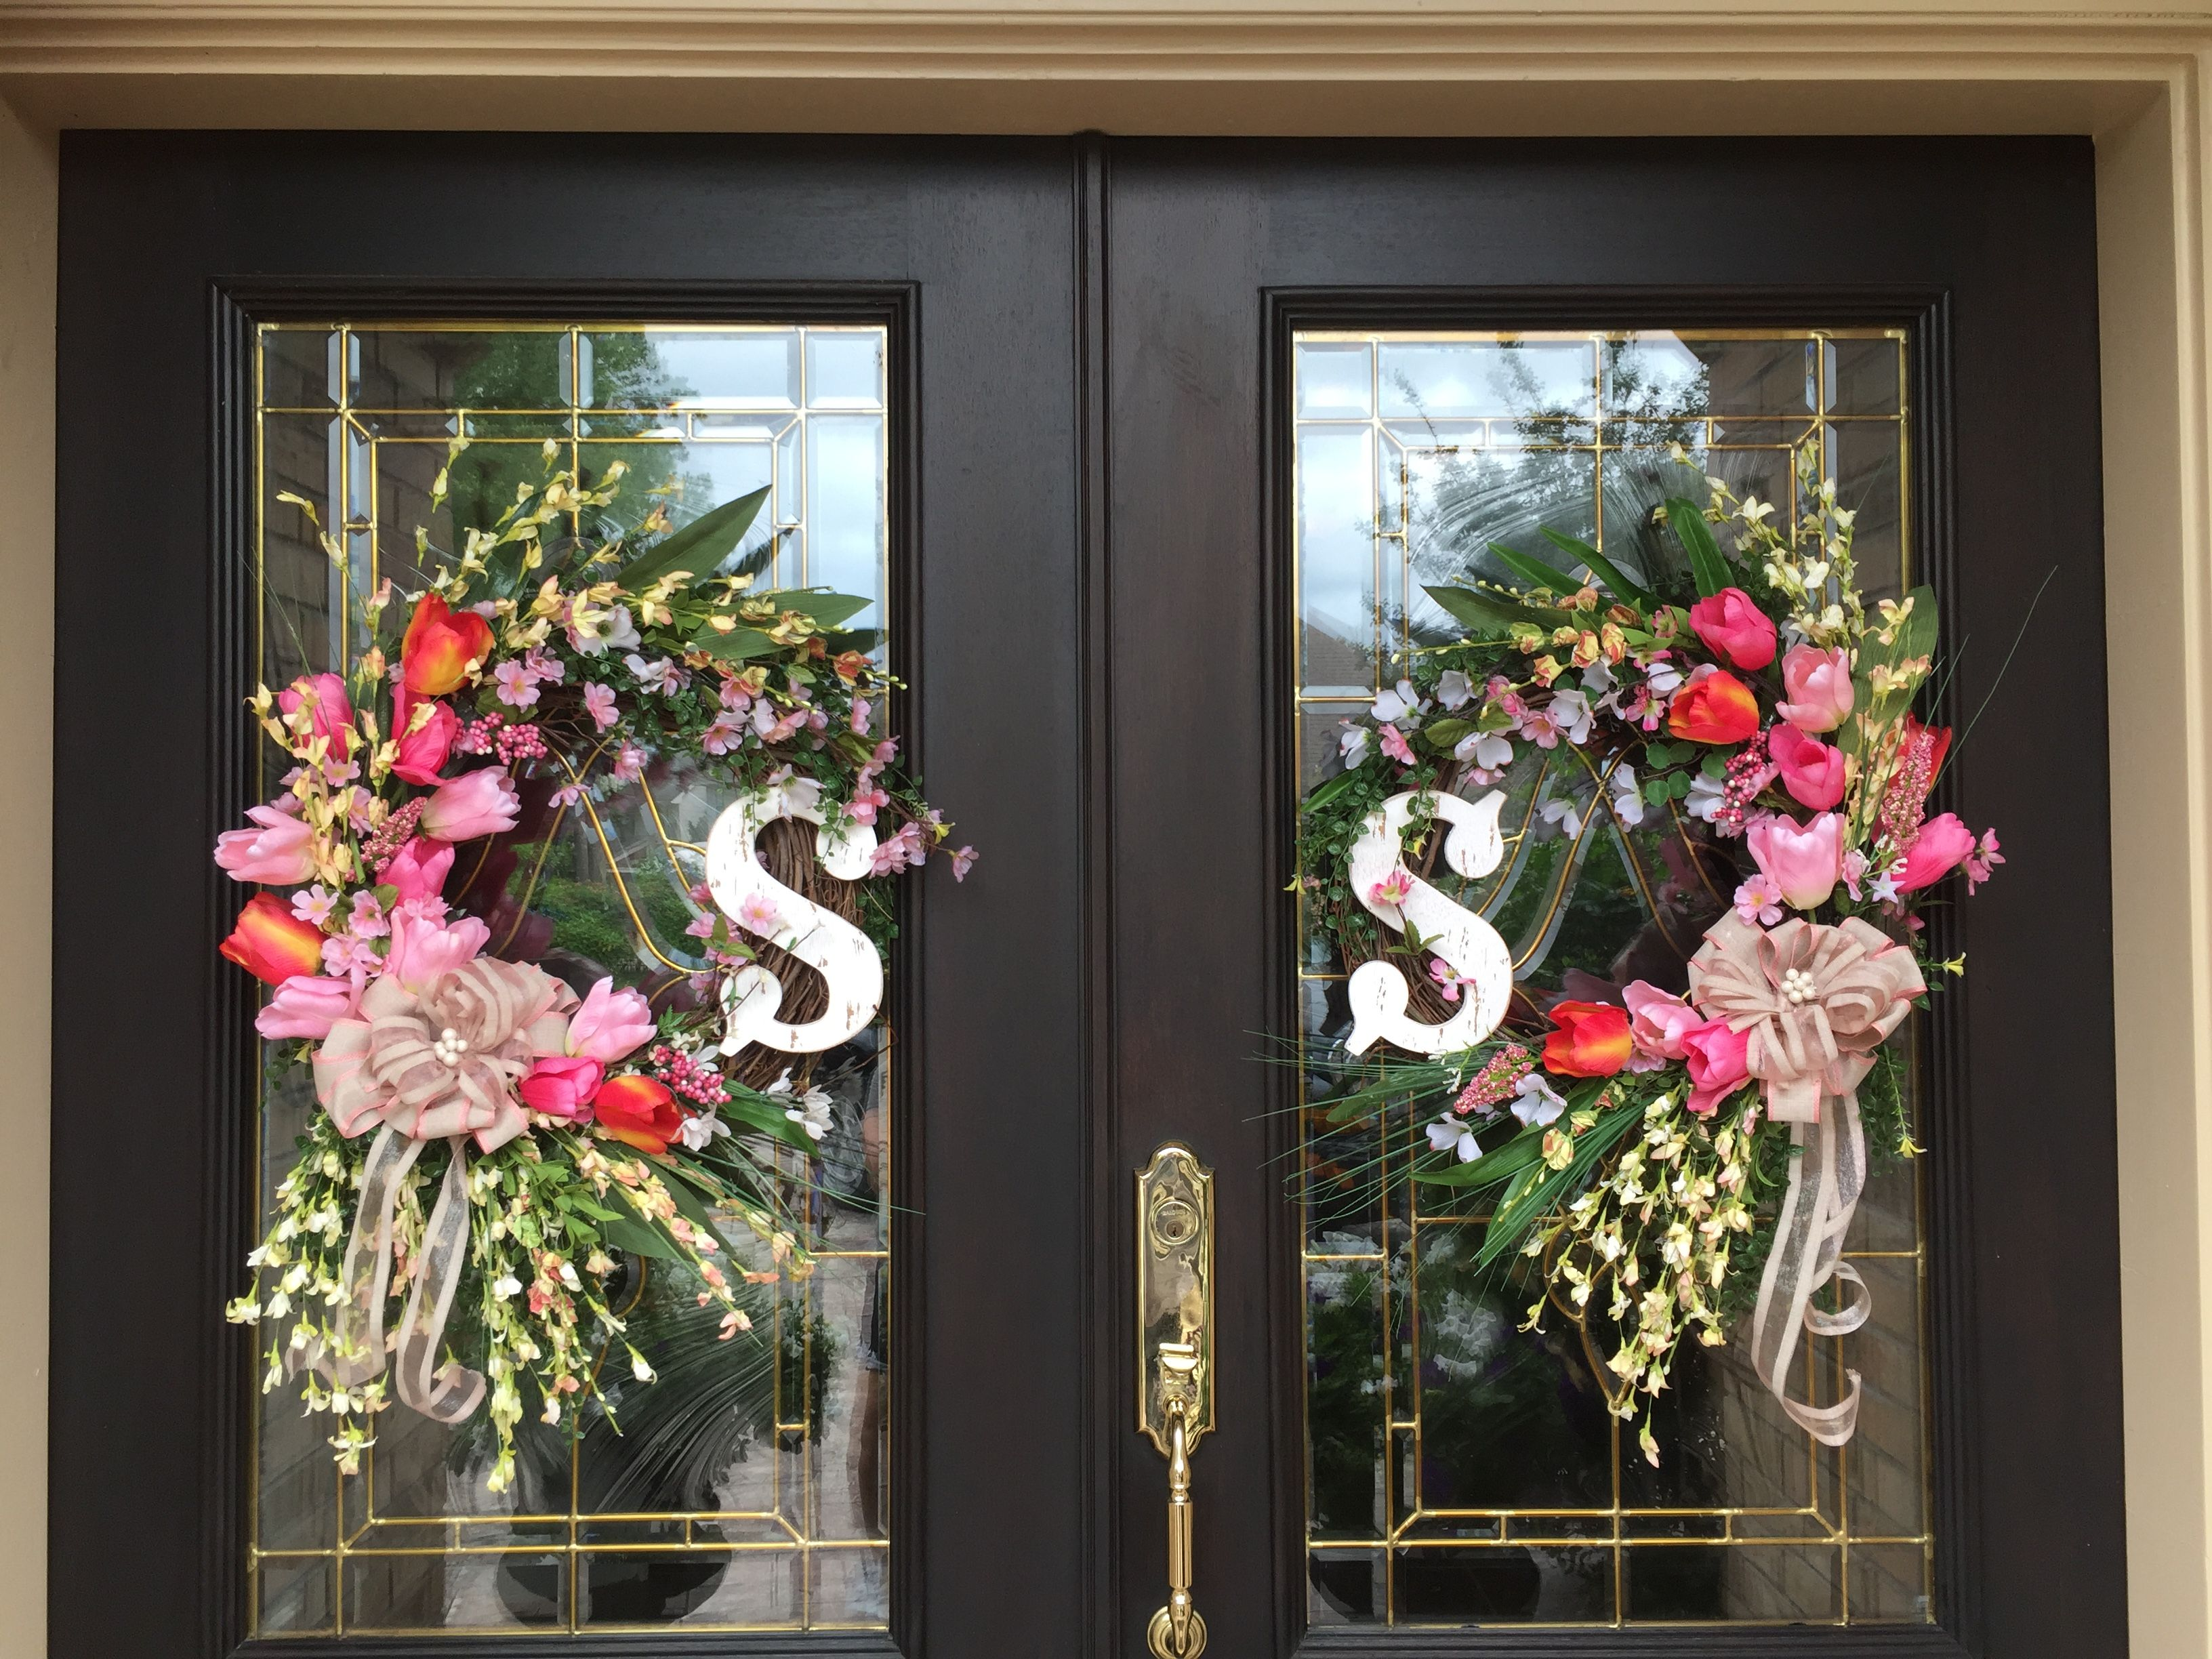 Both wreaths for double doors